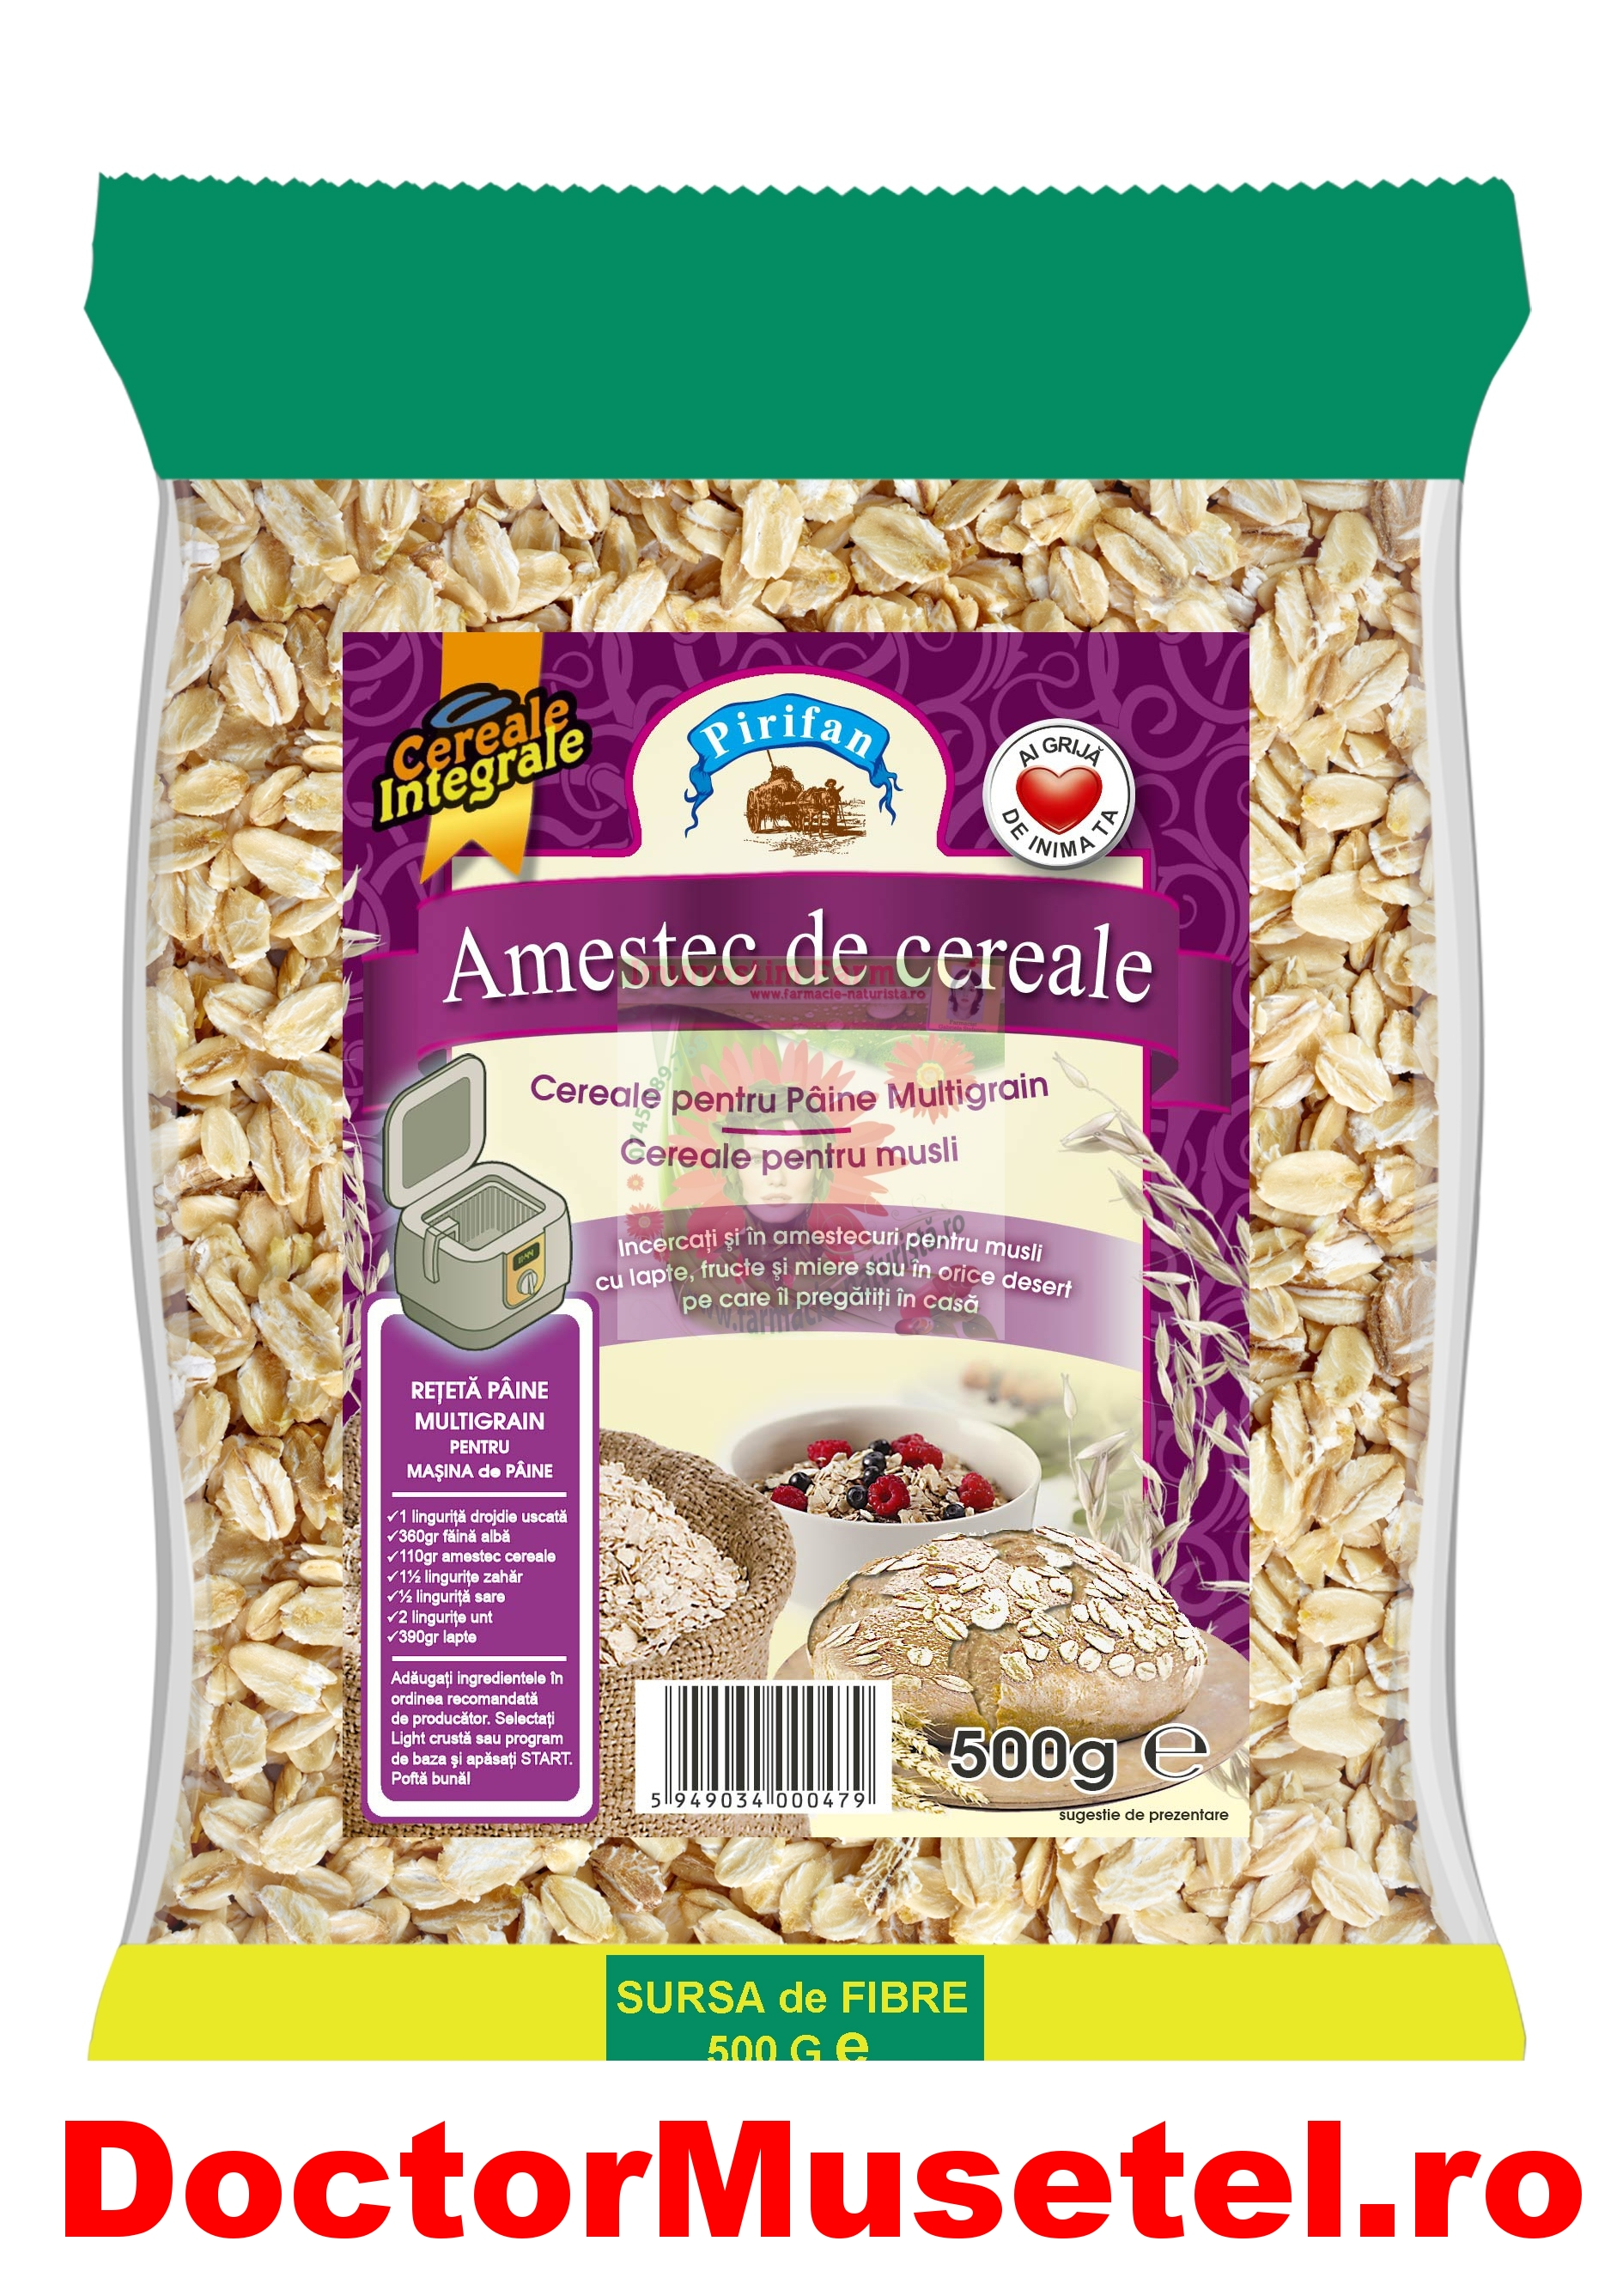 Amestec-de-cereale-500g-PIRIFAN-www-farmacie-naturista-ro.jpg